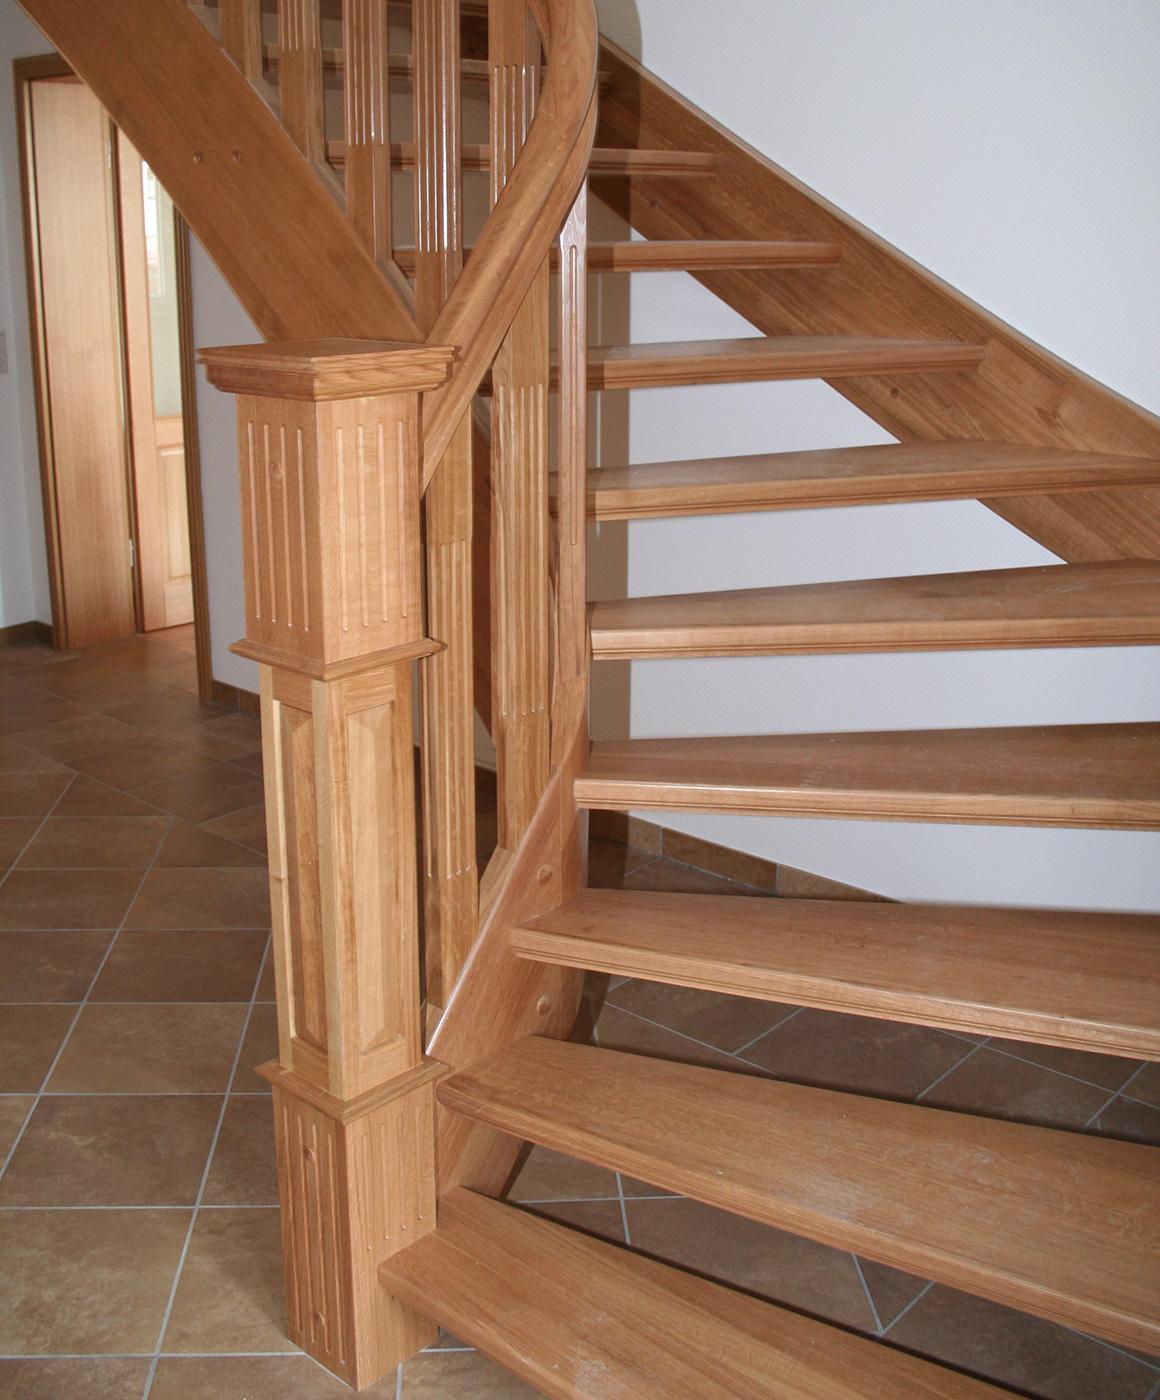 treppen roland plz 15306 vierlinden exklusive massivholztreppe finden sie treppenbauer f r. Black Bedroom Furniture Sets. Home Design Ideas